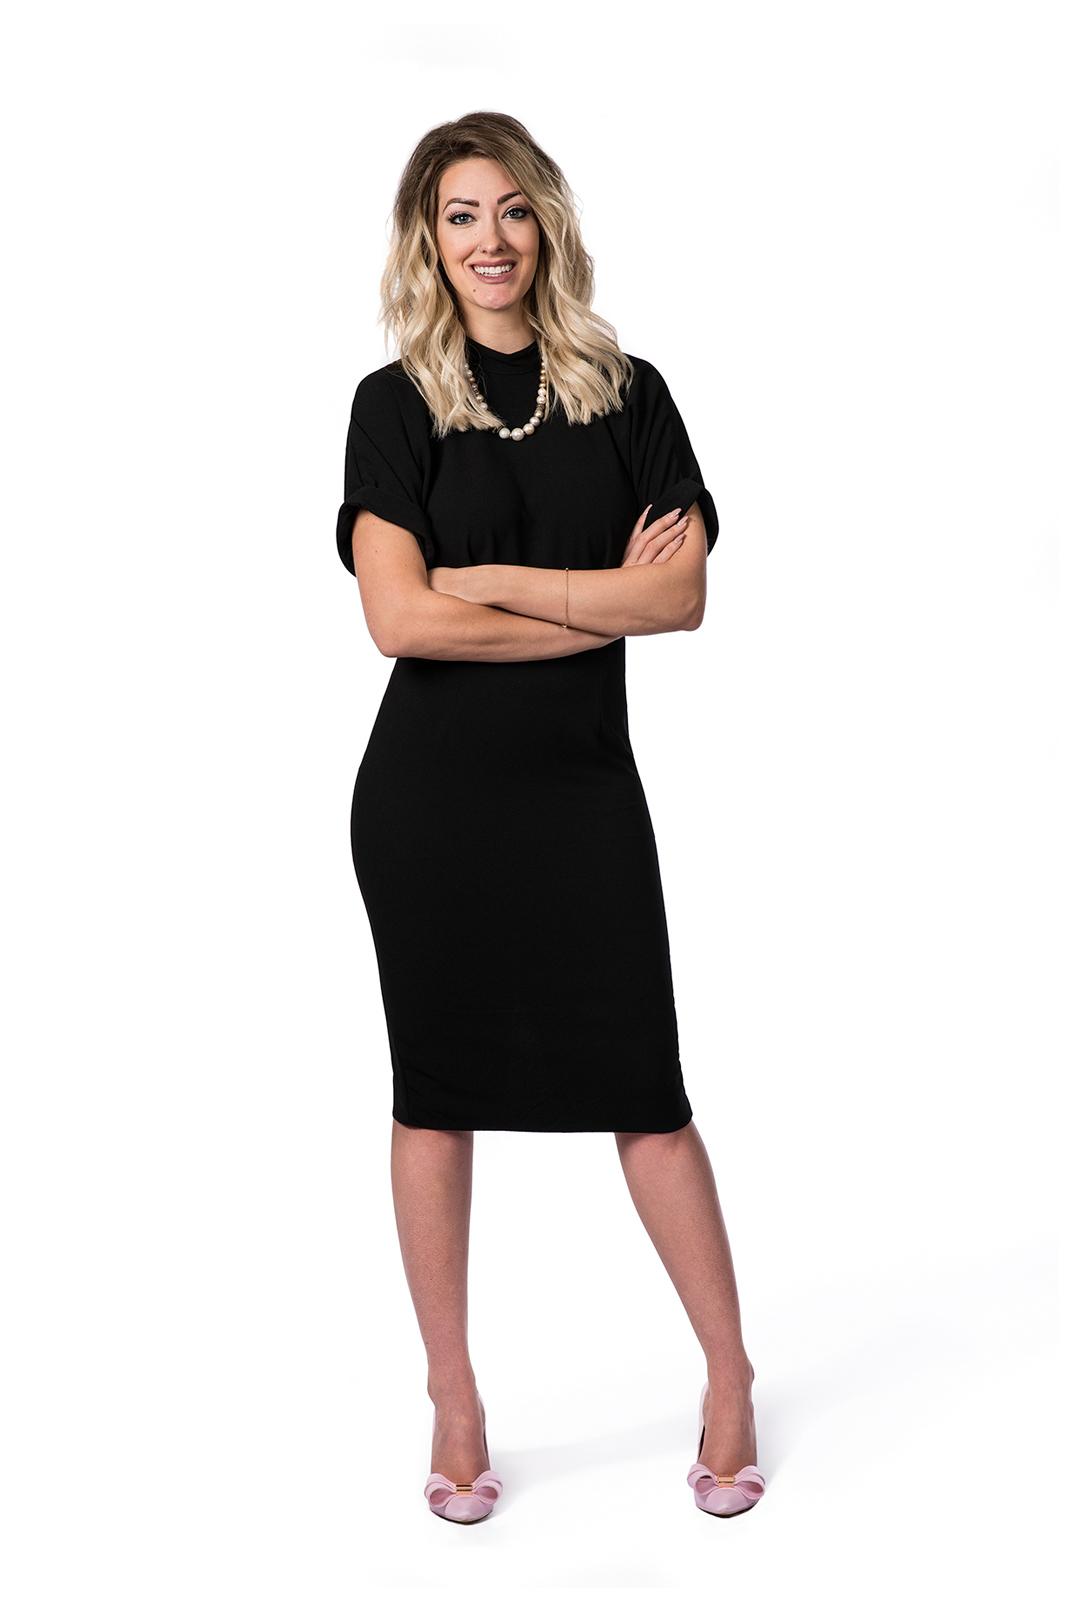 Shayla Ackerman